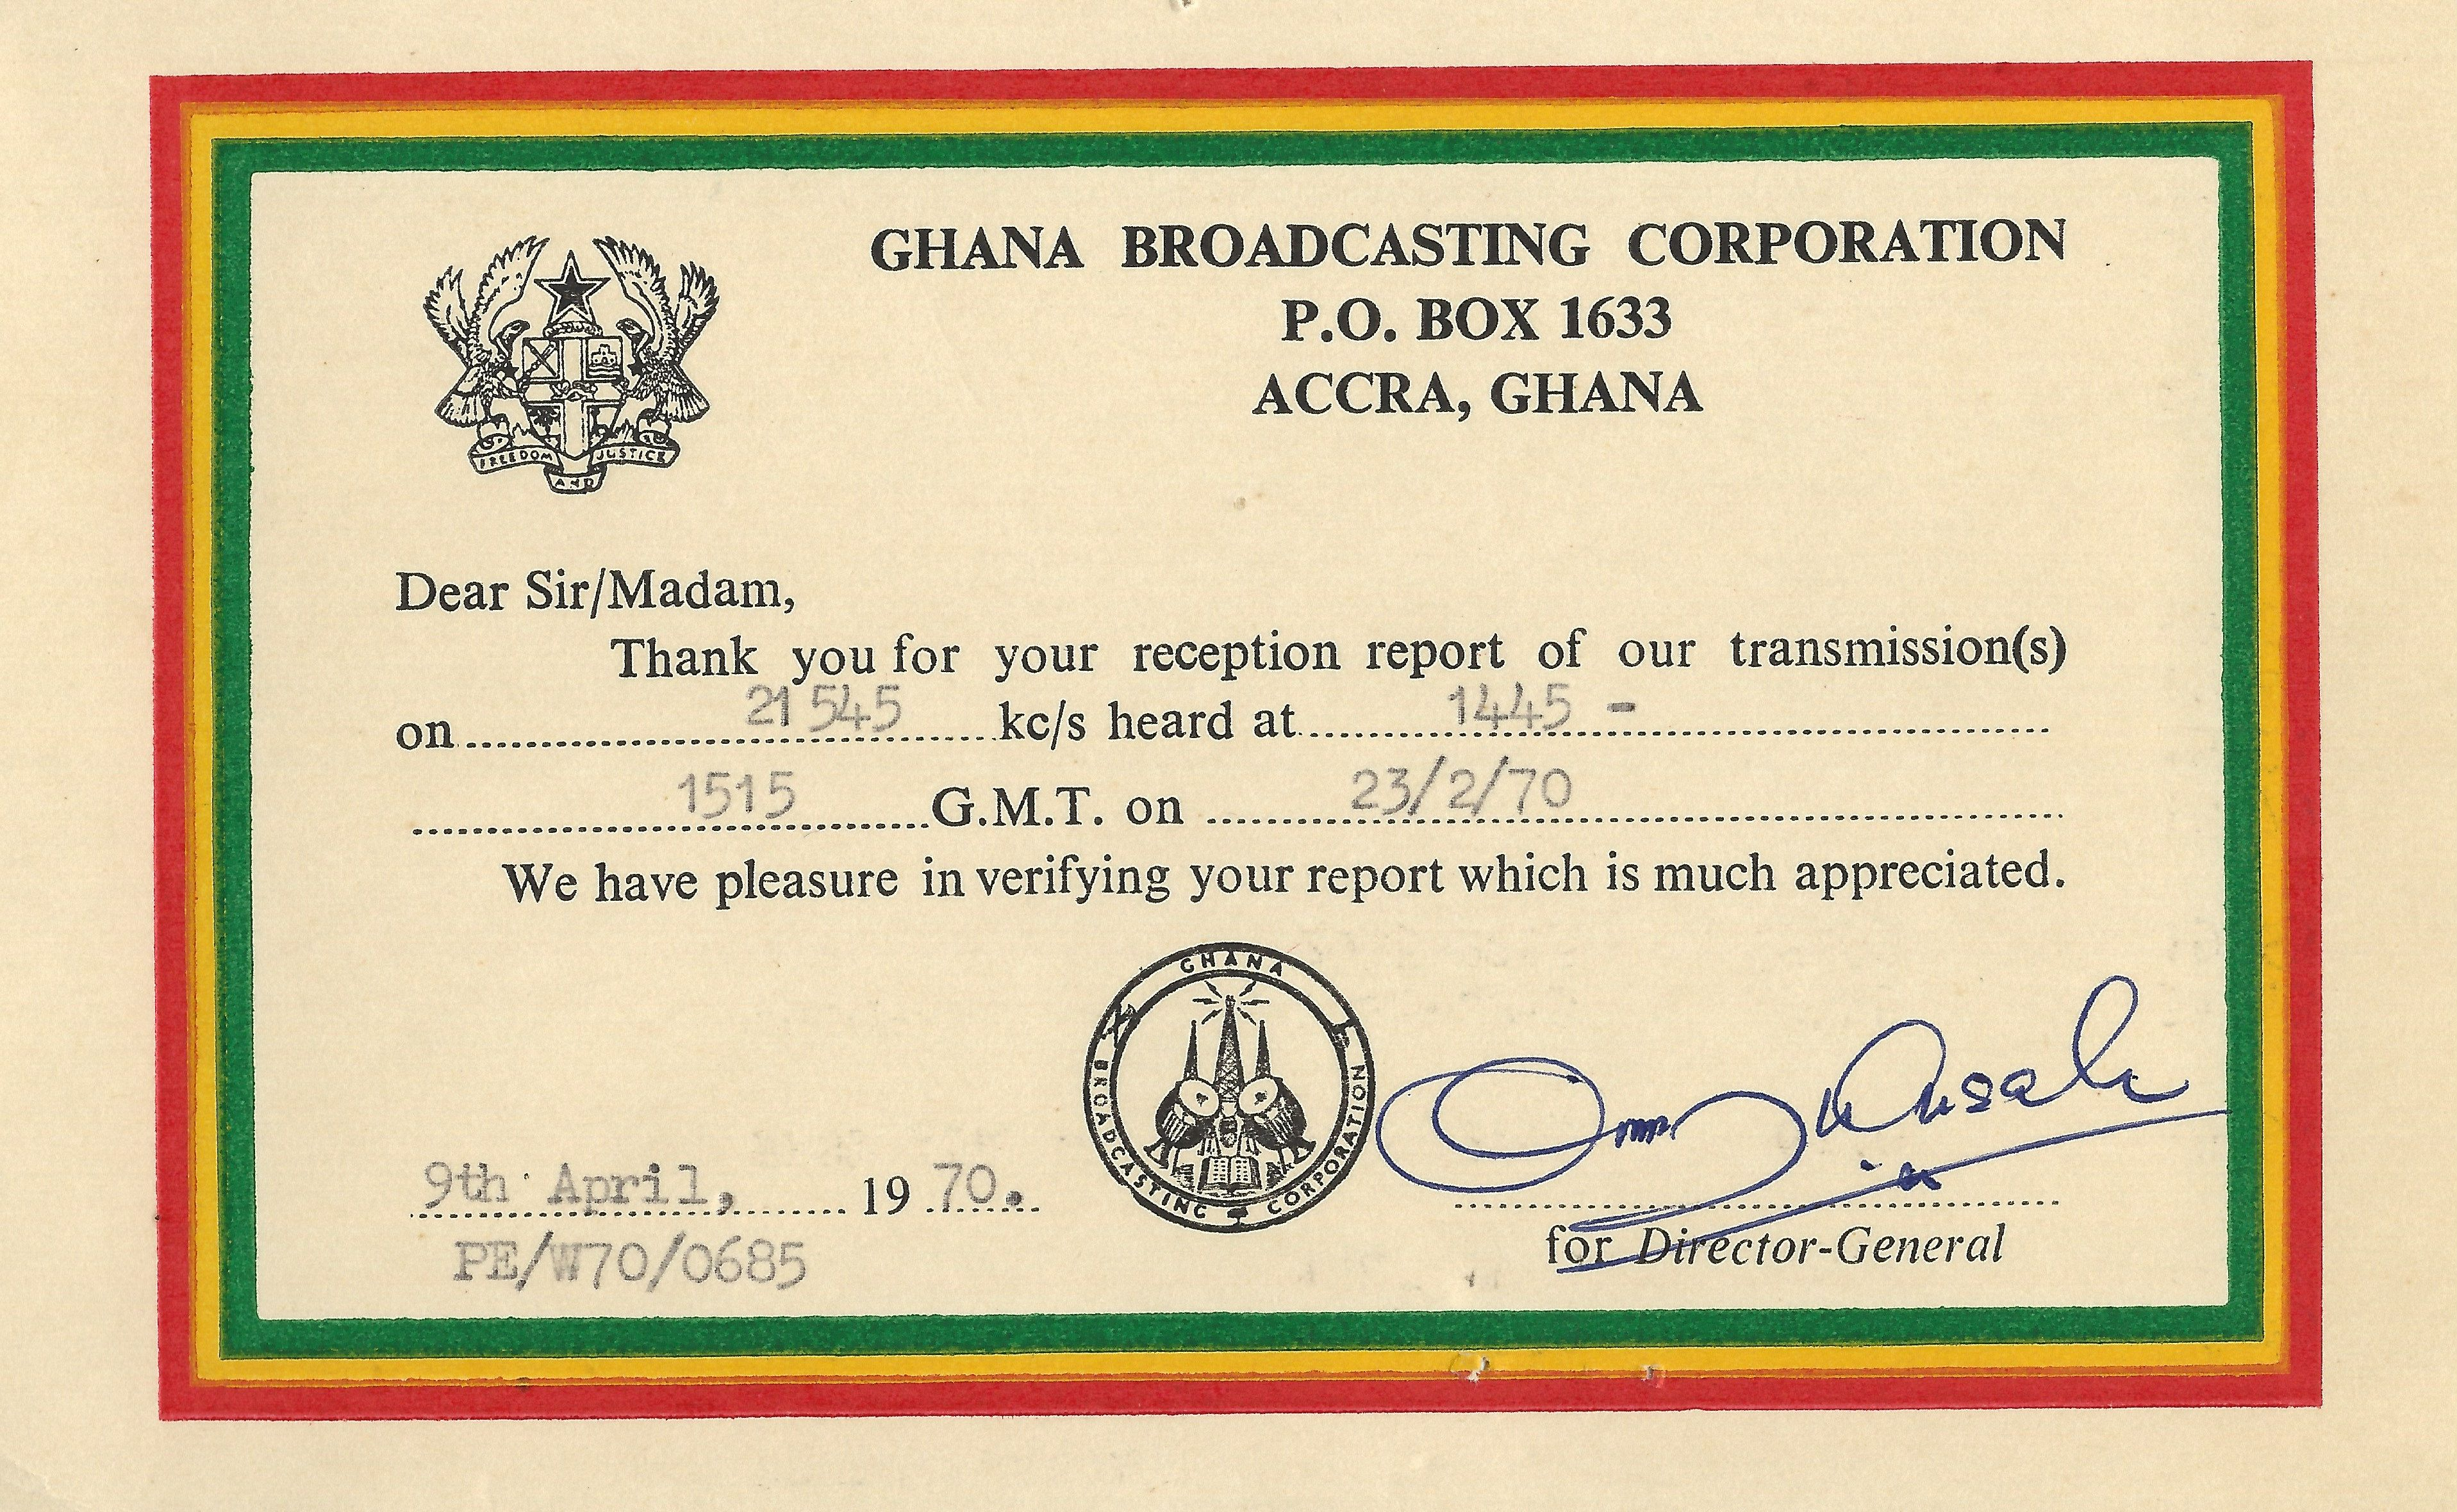 Ghana Broadcasting Corporation, Accra, Ghana